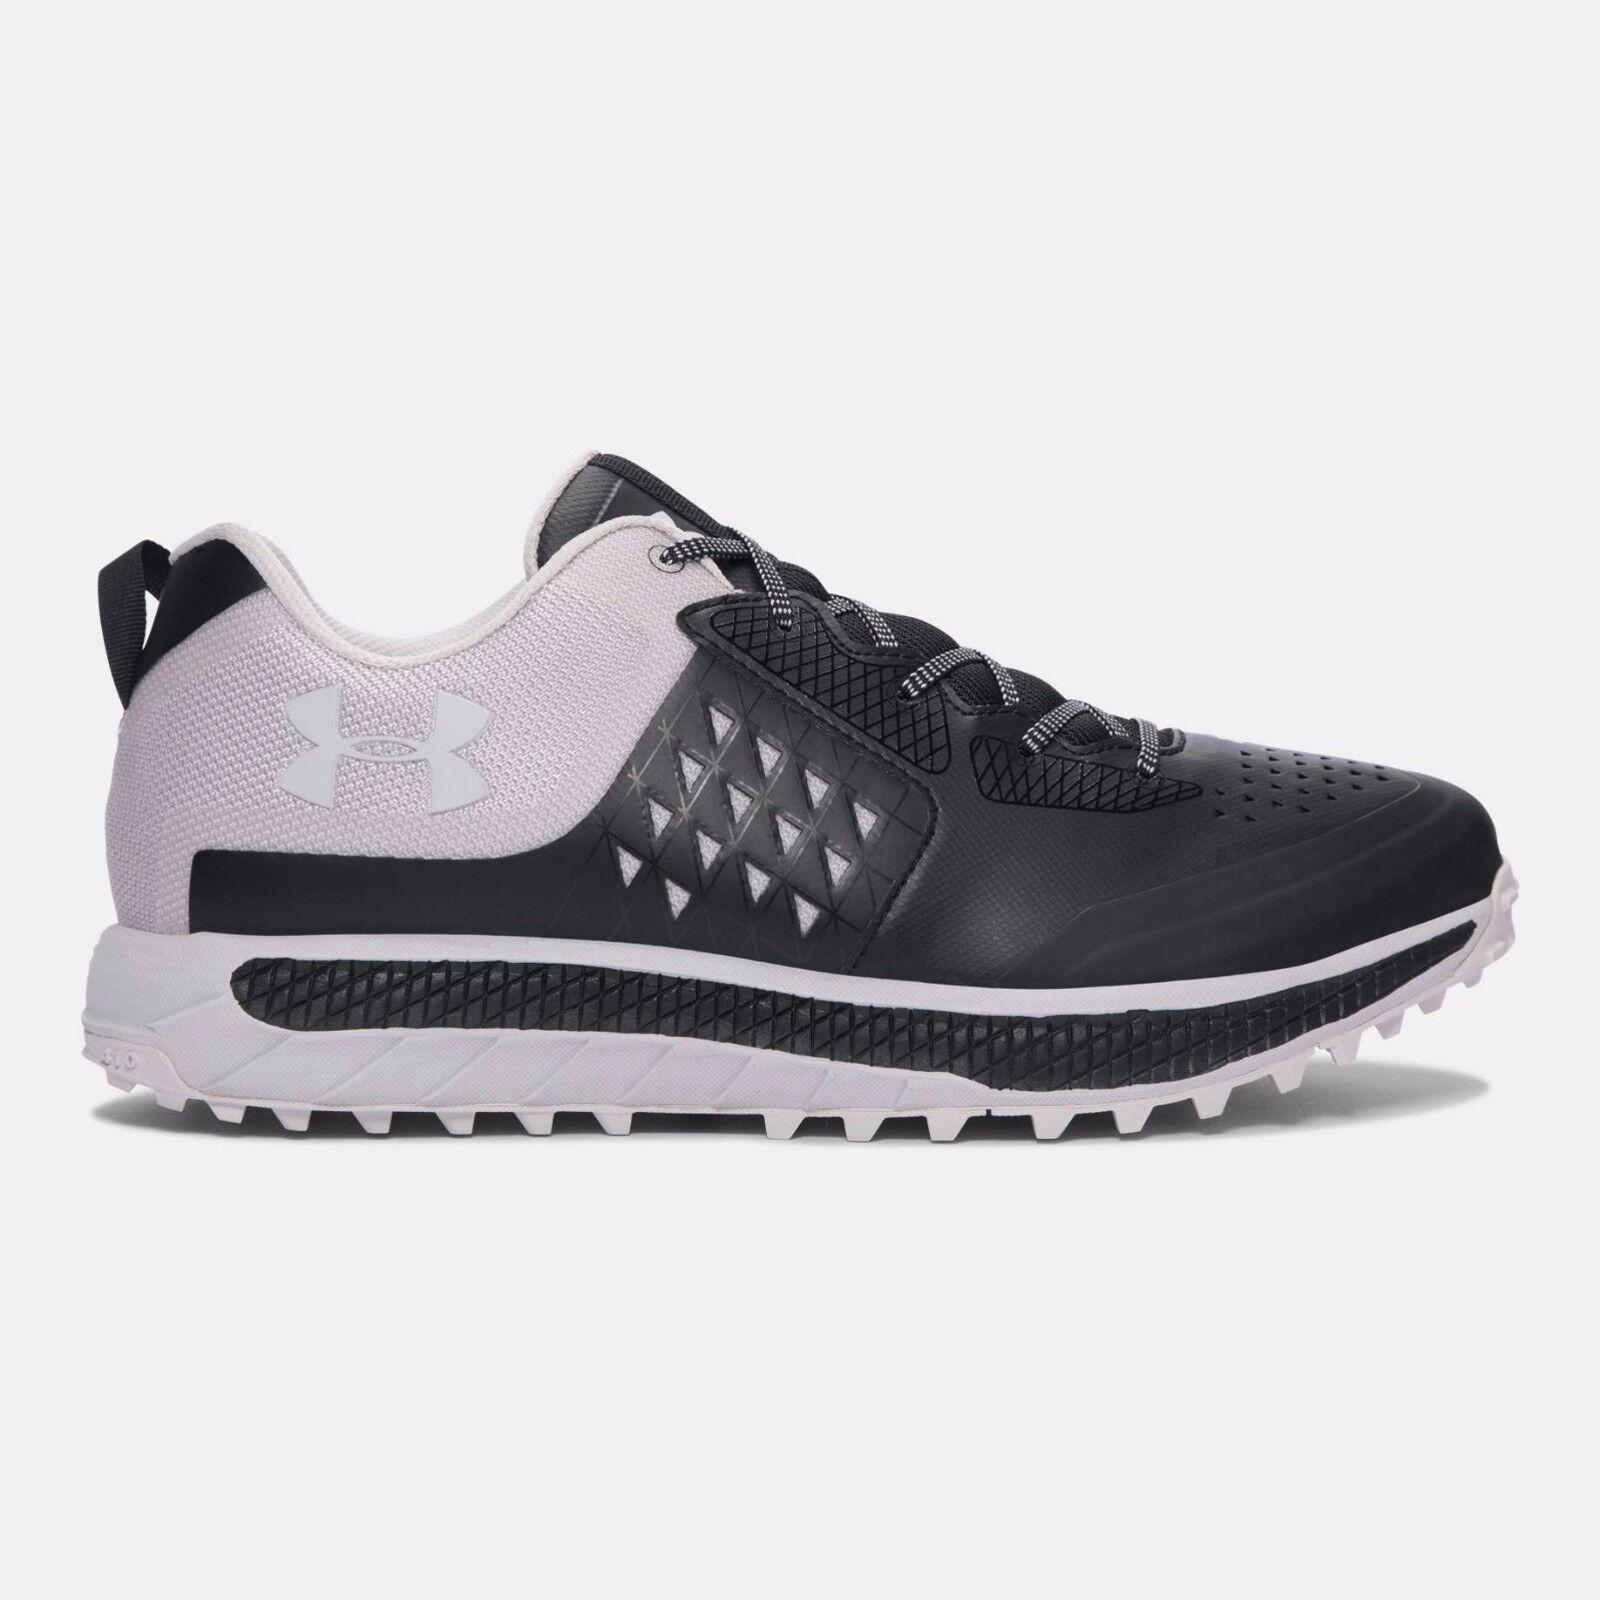 Under Armour Men's Horizon STR Running Shoes Black/Gray Matter(1288967-003)